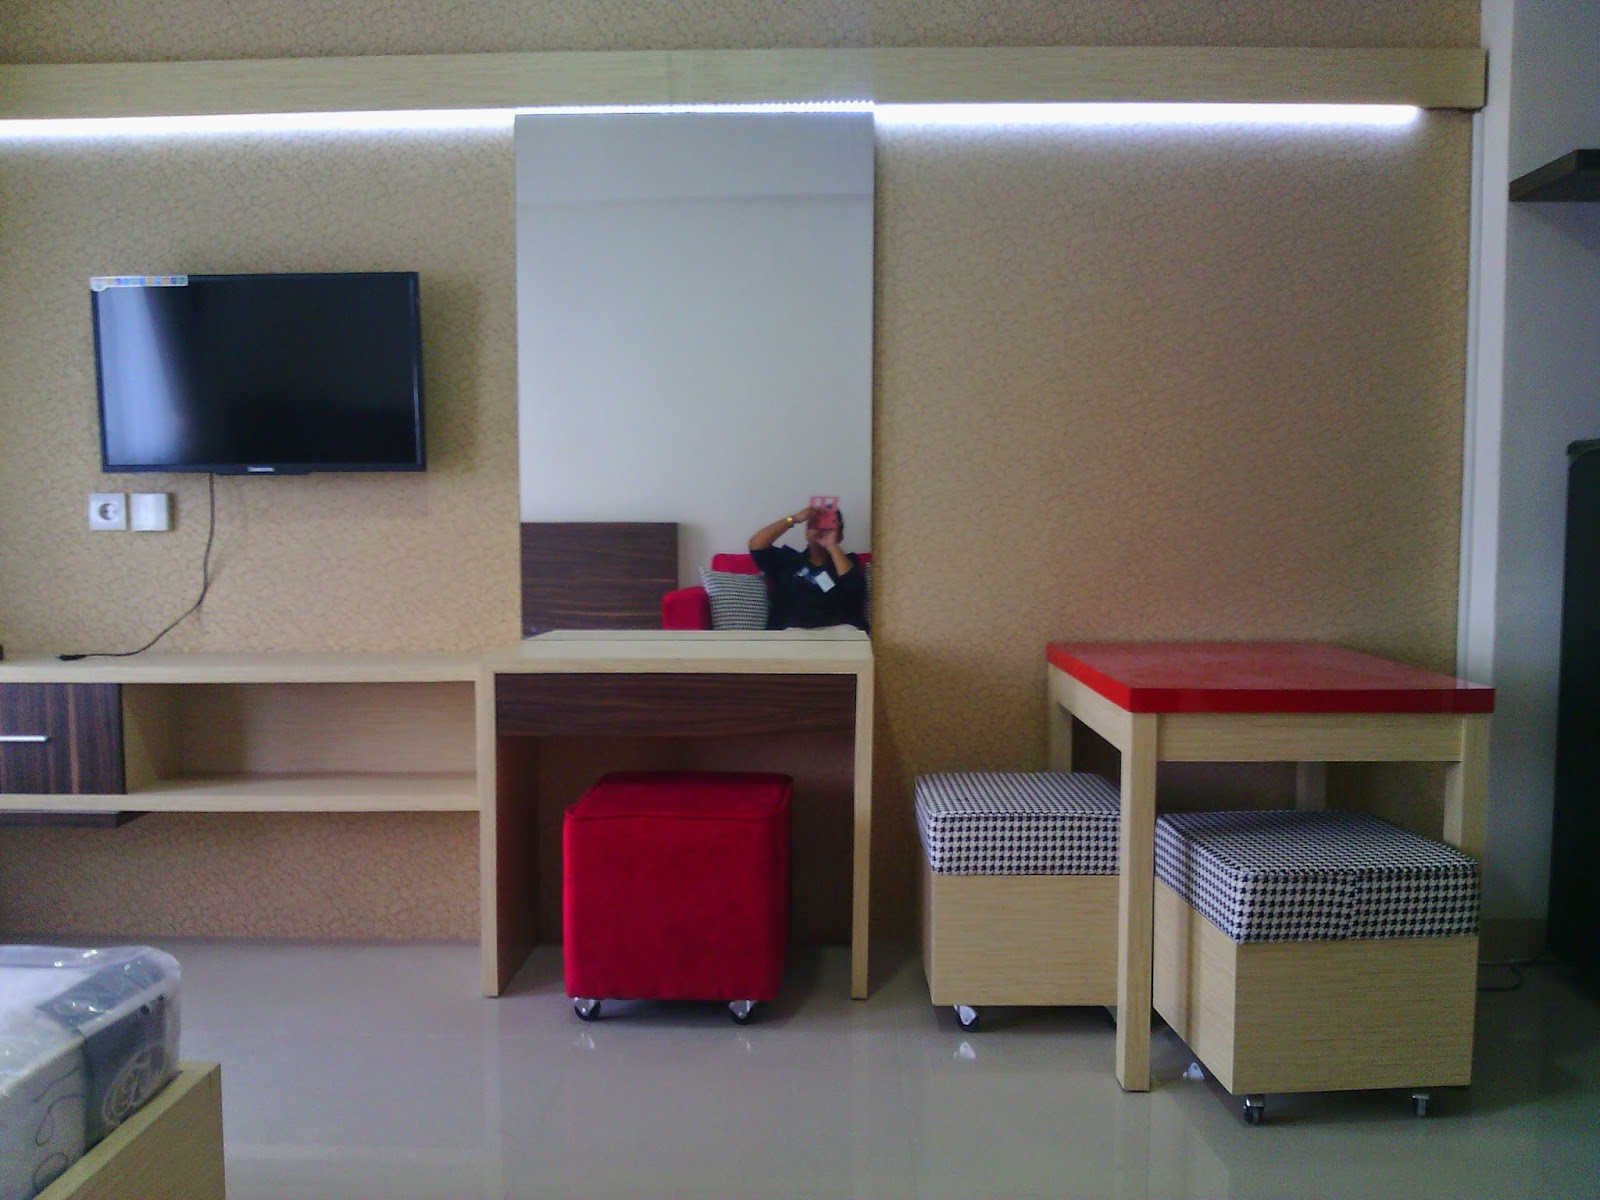 Sofa Studio Musik Bandung Best For Sleeping Wedesignstudio Jasa Desain Interior And Kontraktor